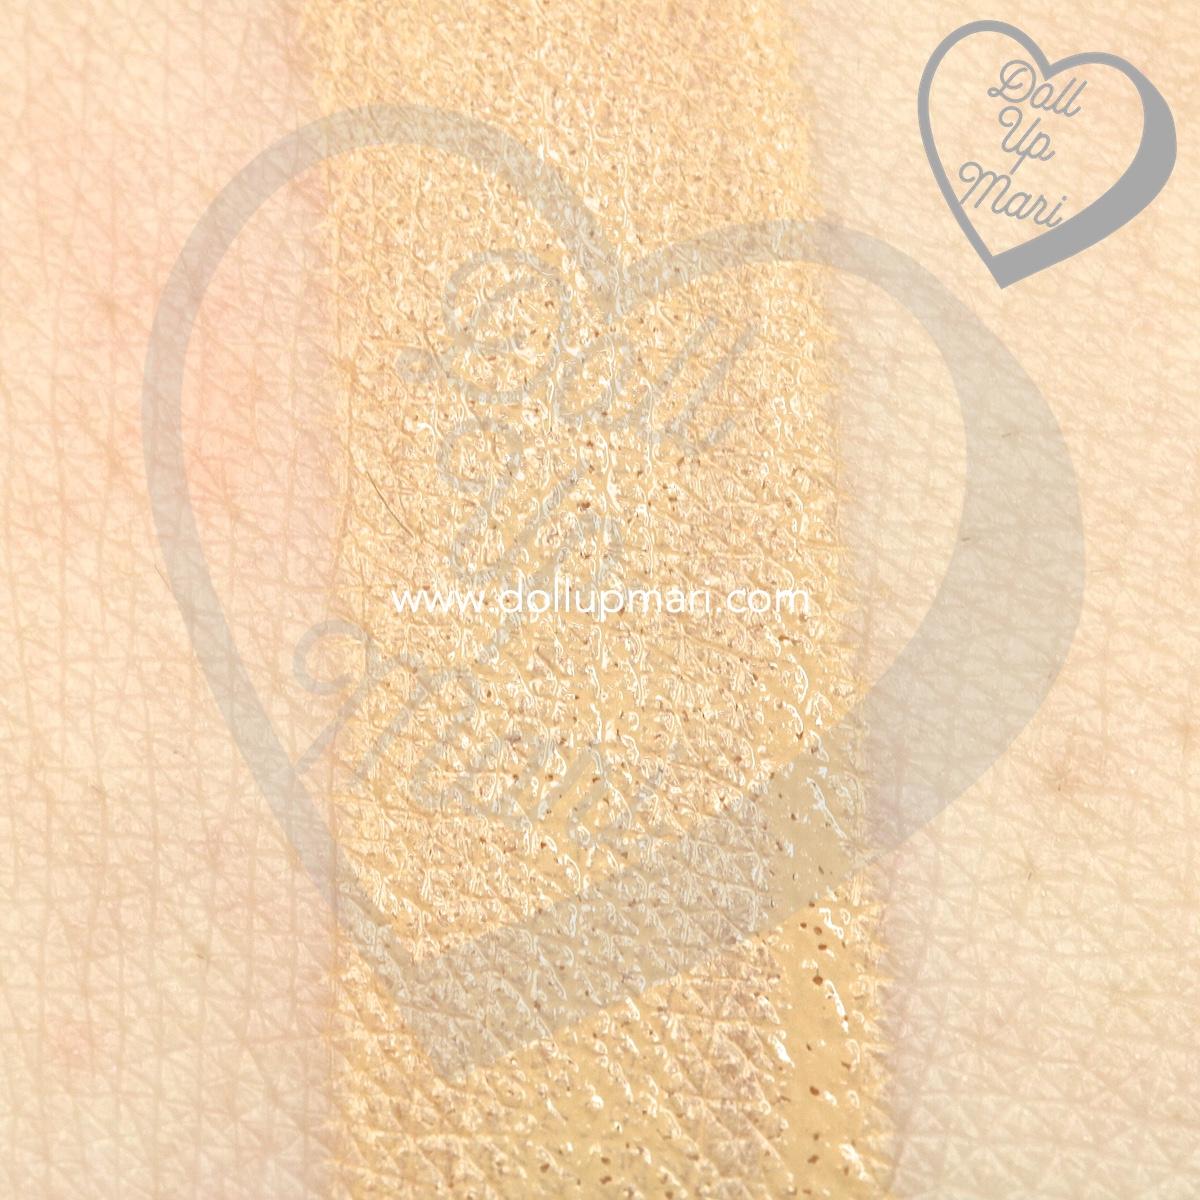 Swatch of L'Oréal Paris Infallible 24HR Fresh Wear Liquid Foundation SPF25PA+++ in shade Golden Beige